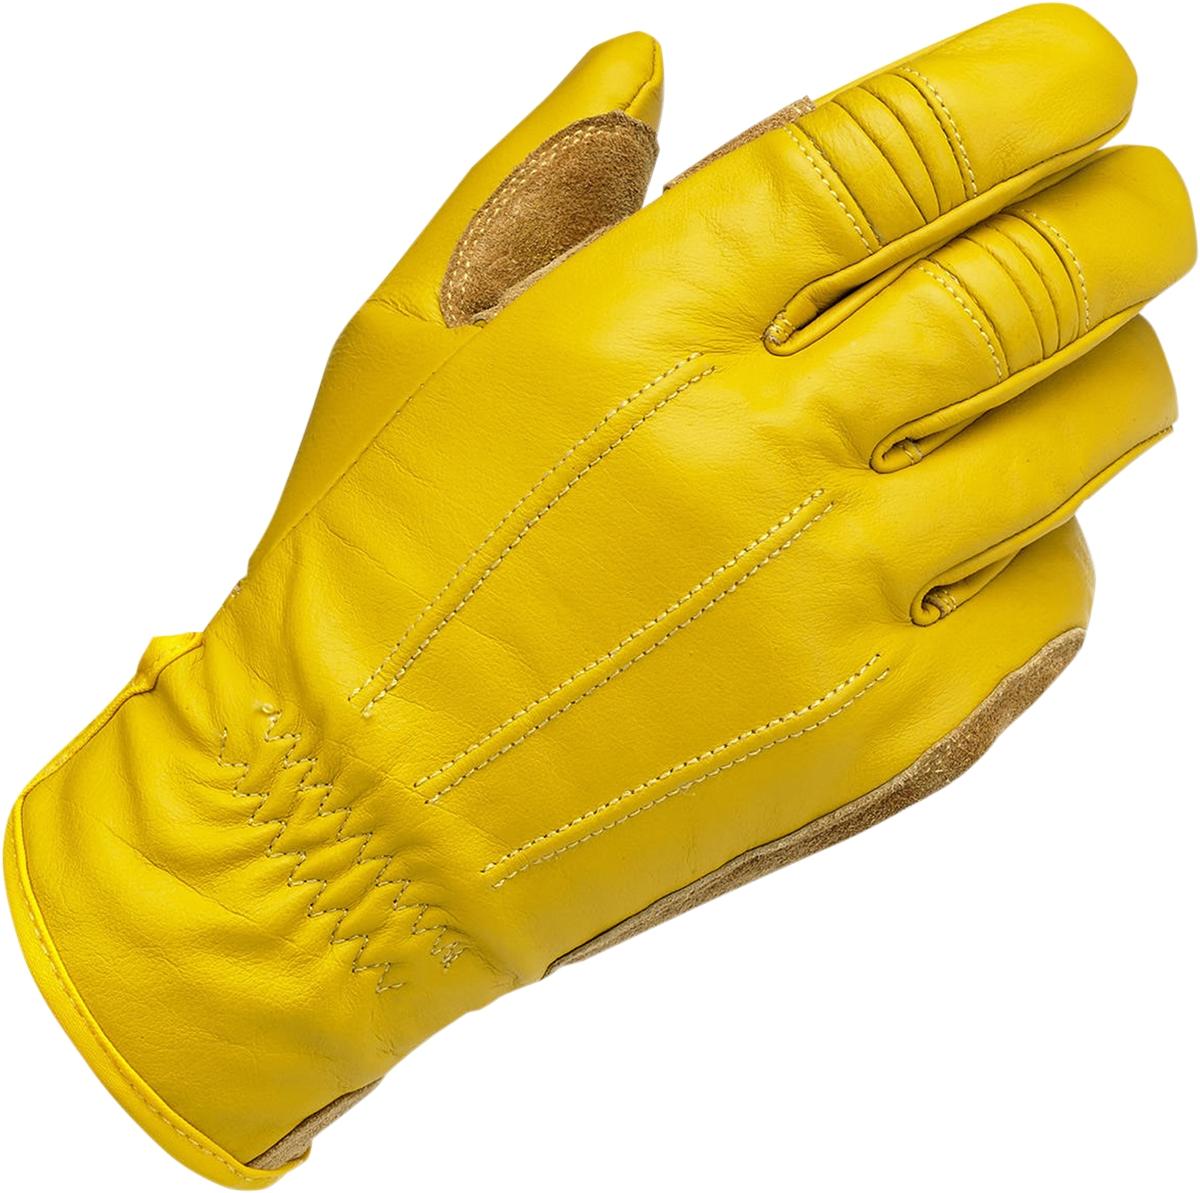 Leather work gloves ebay - Biltwell Gold Leather Mens 039 Motorcycle Work Gloves